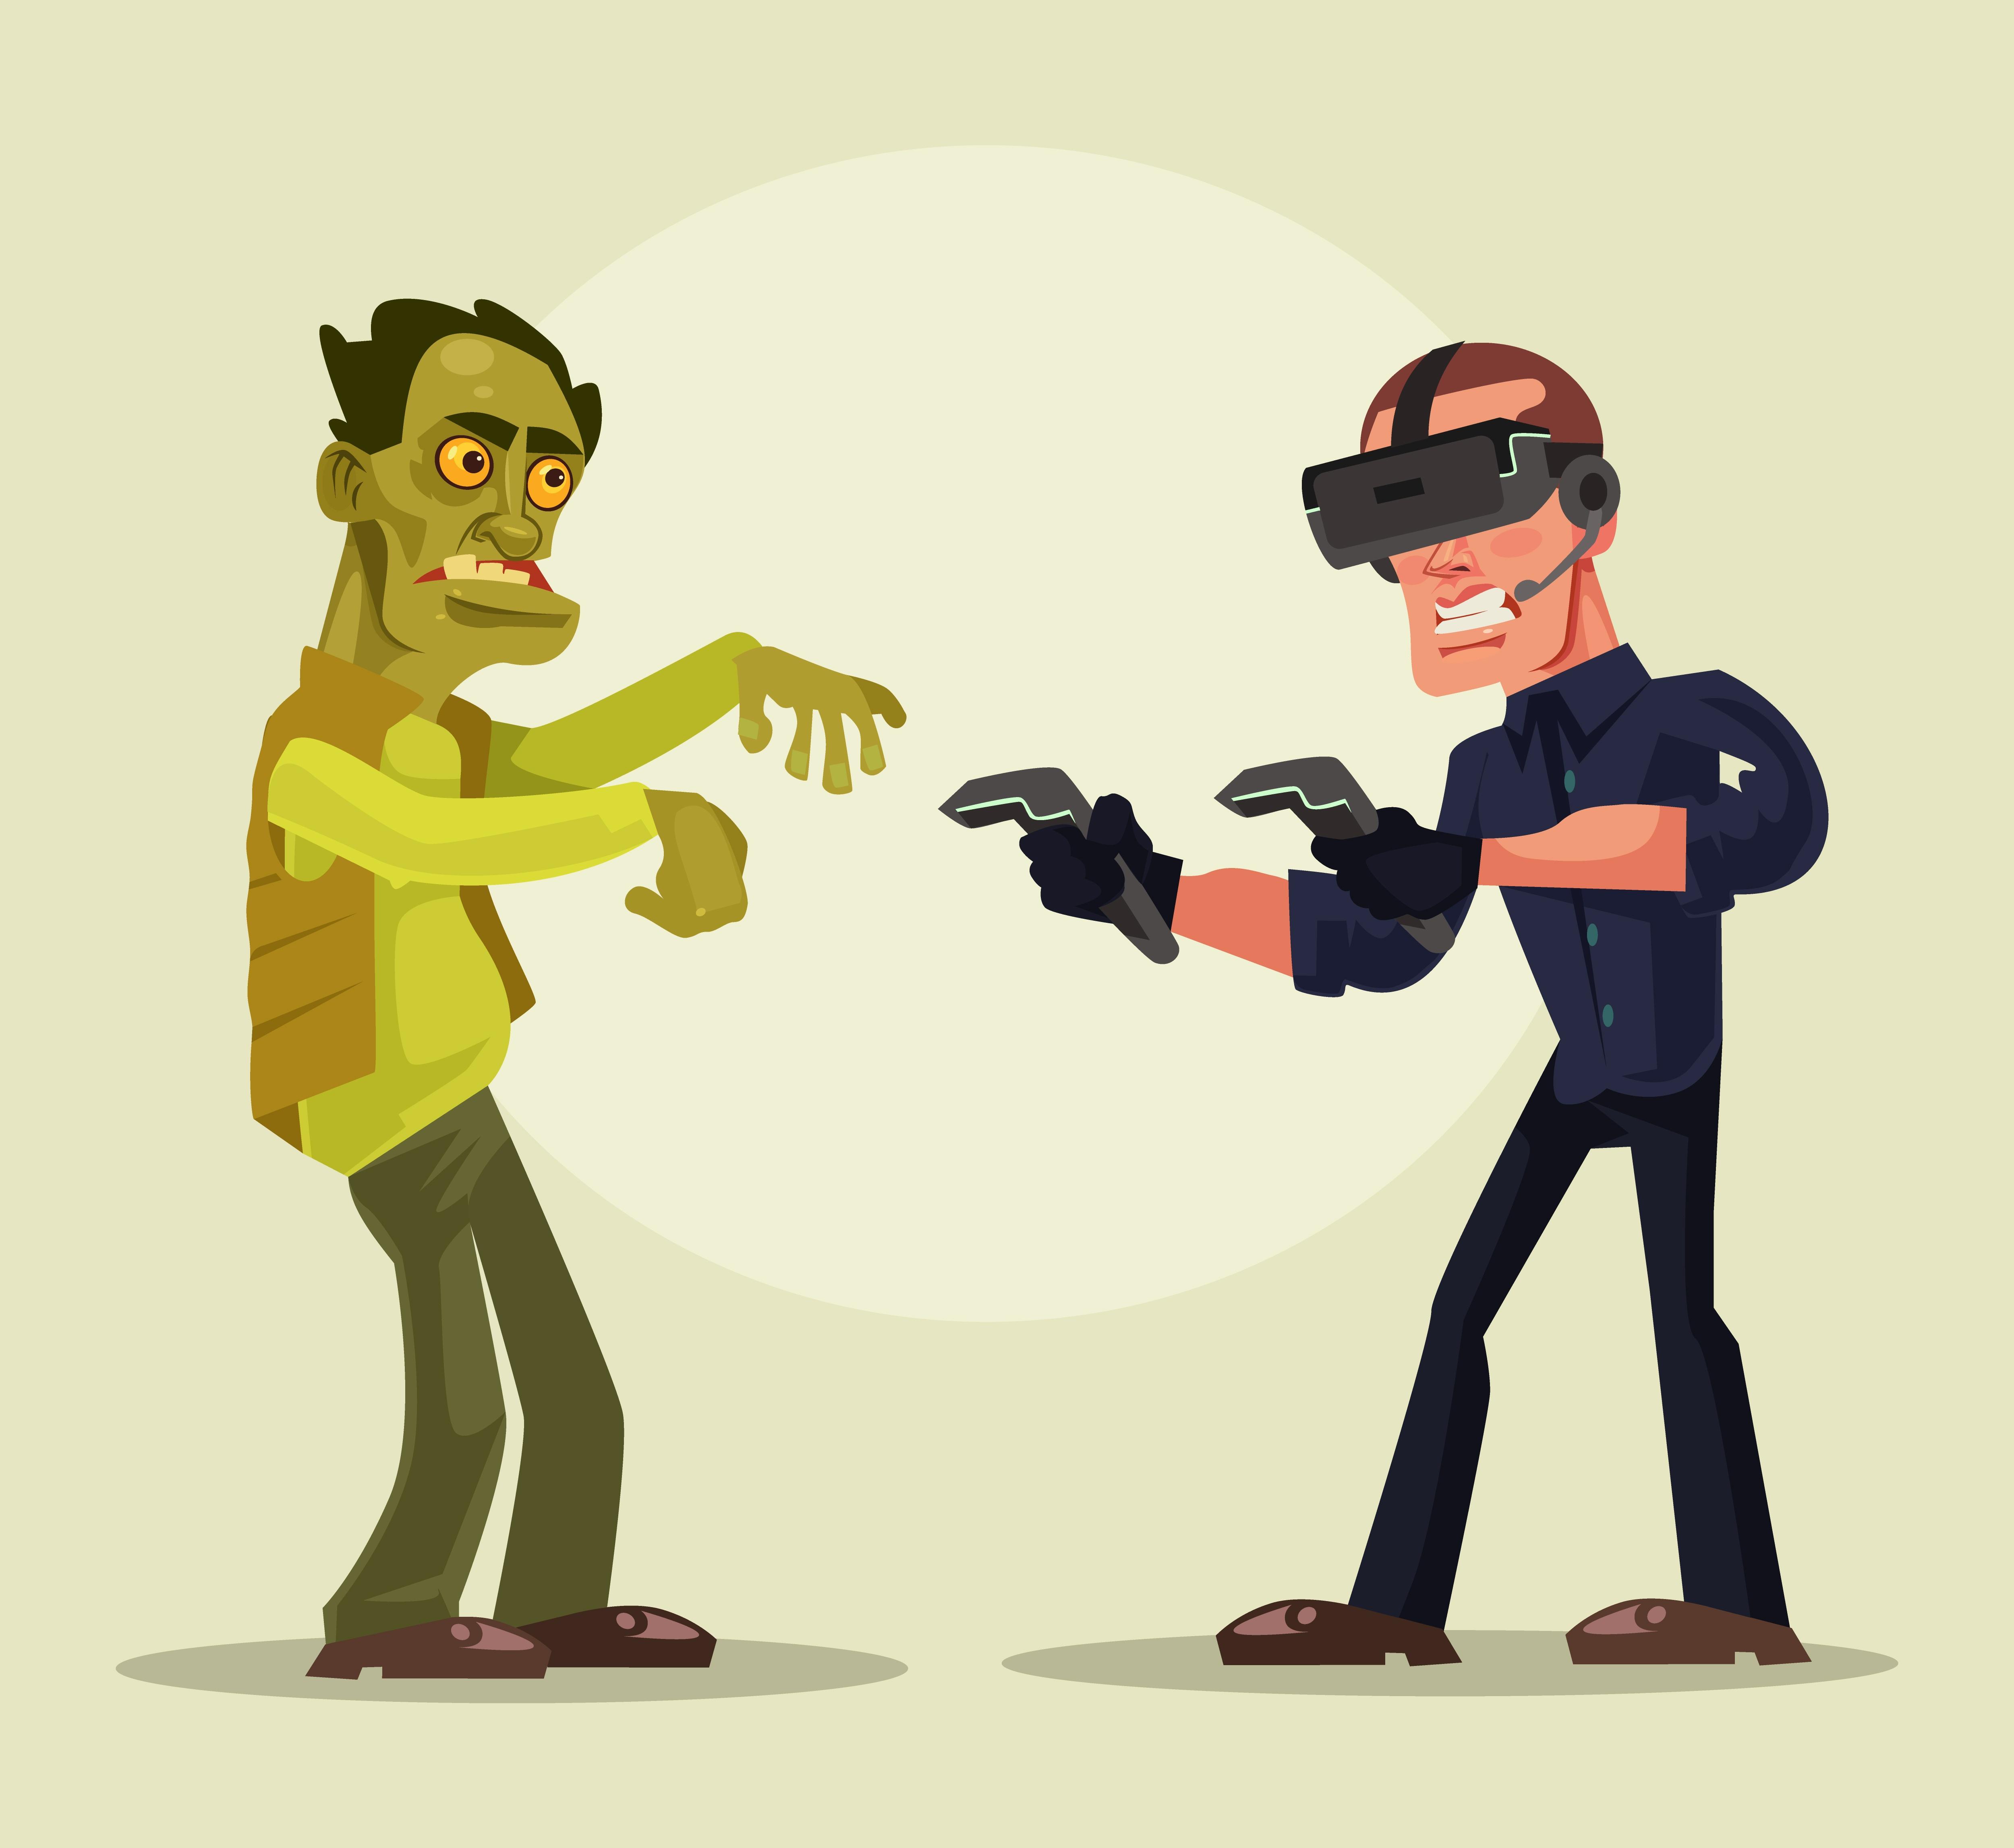 vr-zombie-battle